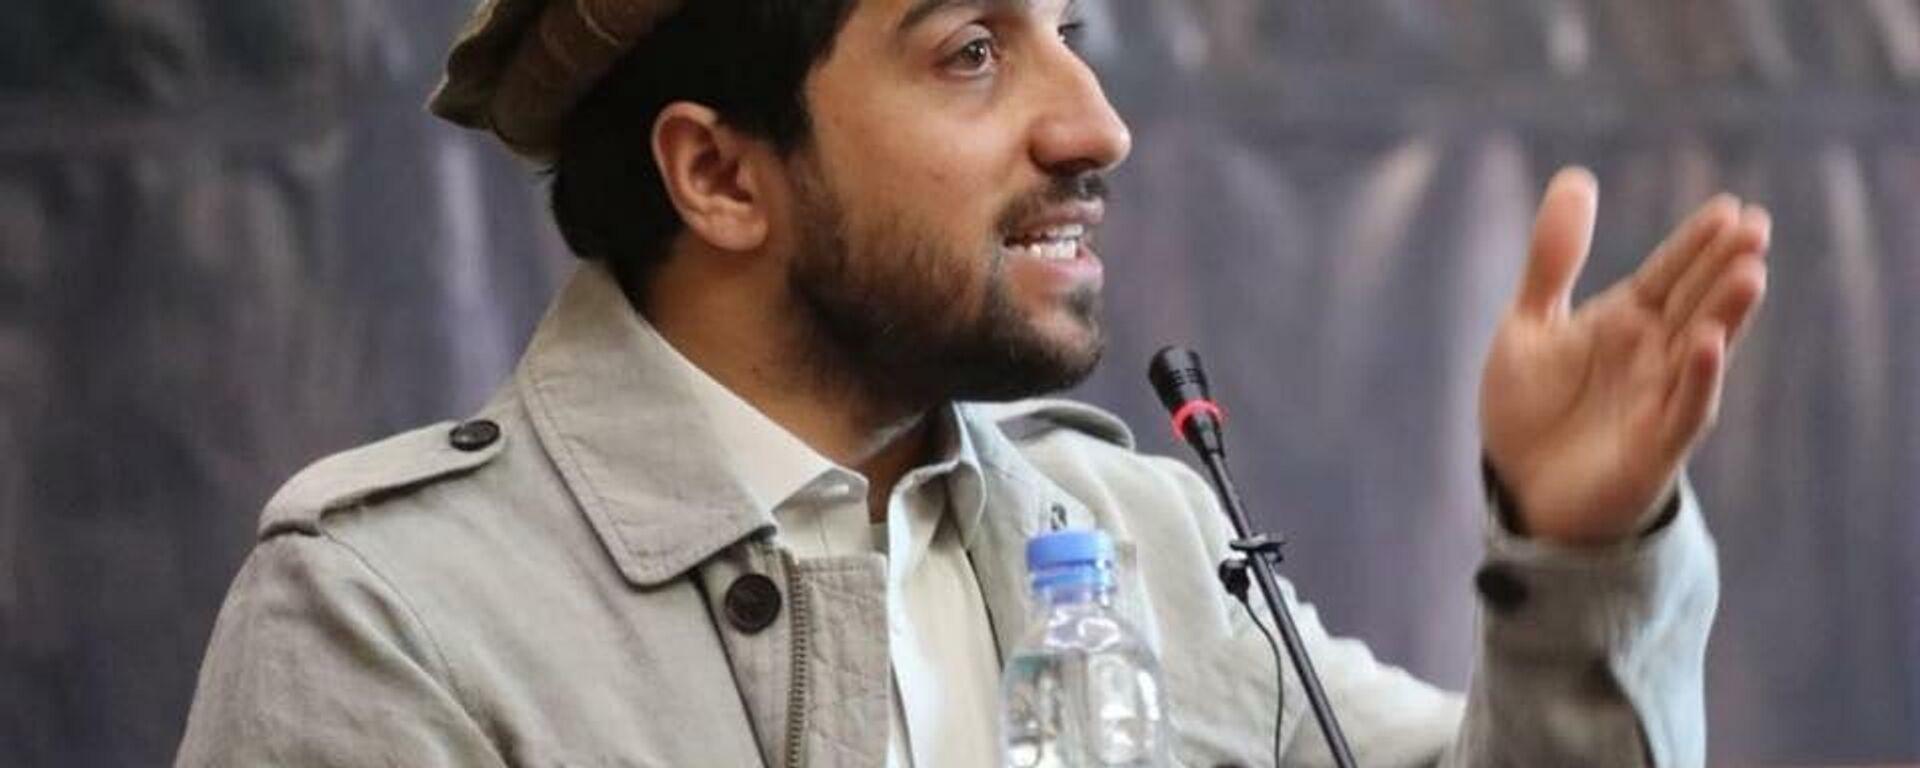 Ахмад Масуд, сын покойного афганского политика и военачальника Ахмад Шаха Масуда - Sputnik Таджикистан, 1920, 25.09.2021